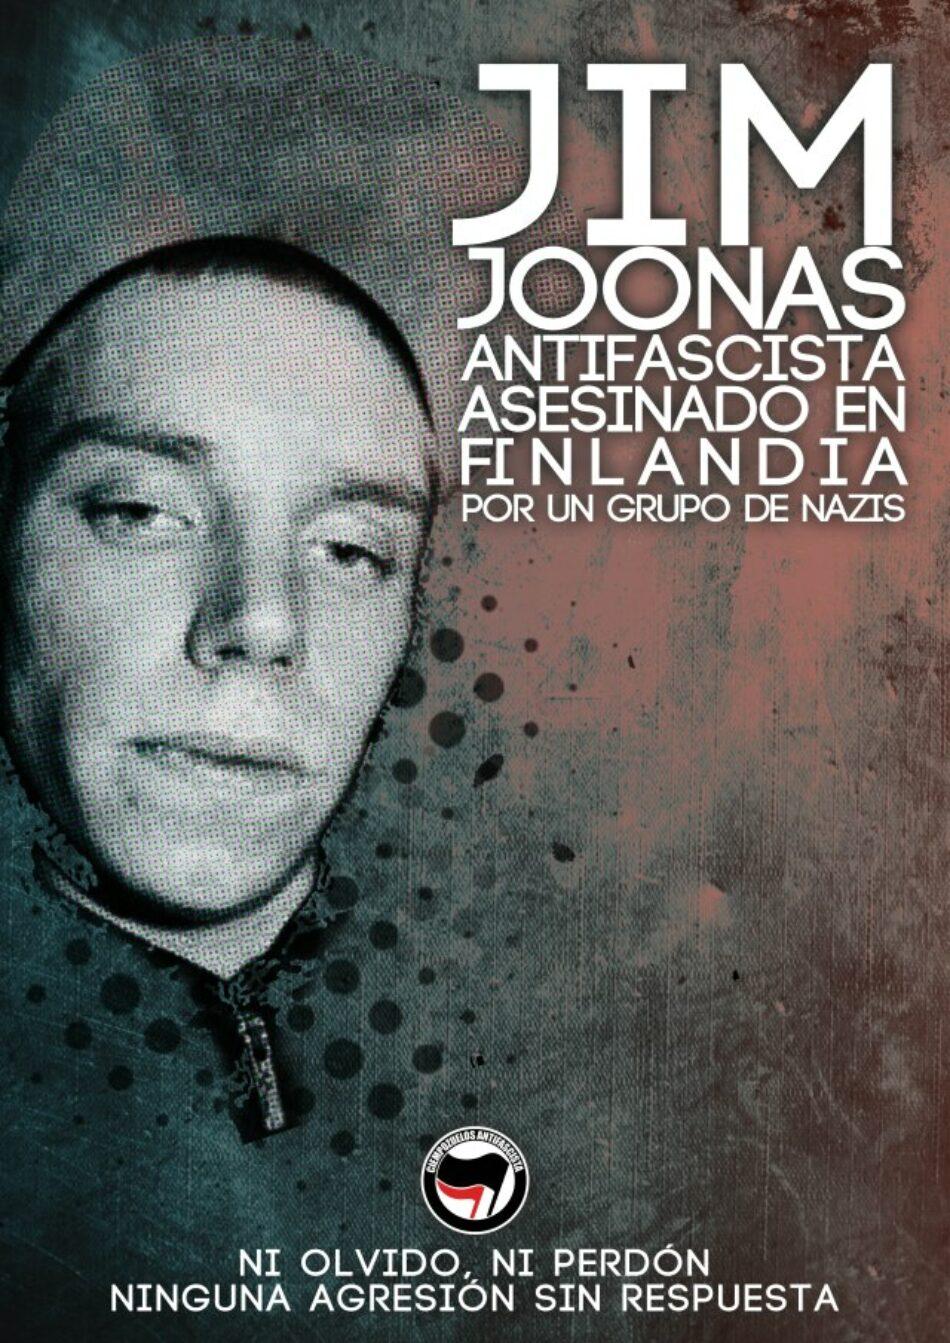 Finlandia: Jim Joonas, antifascista asesinado en Helsinki